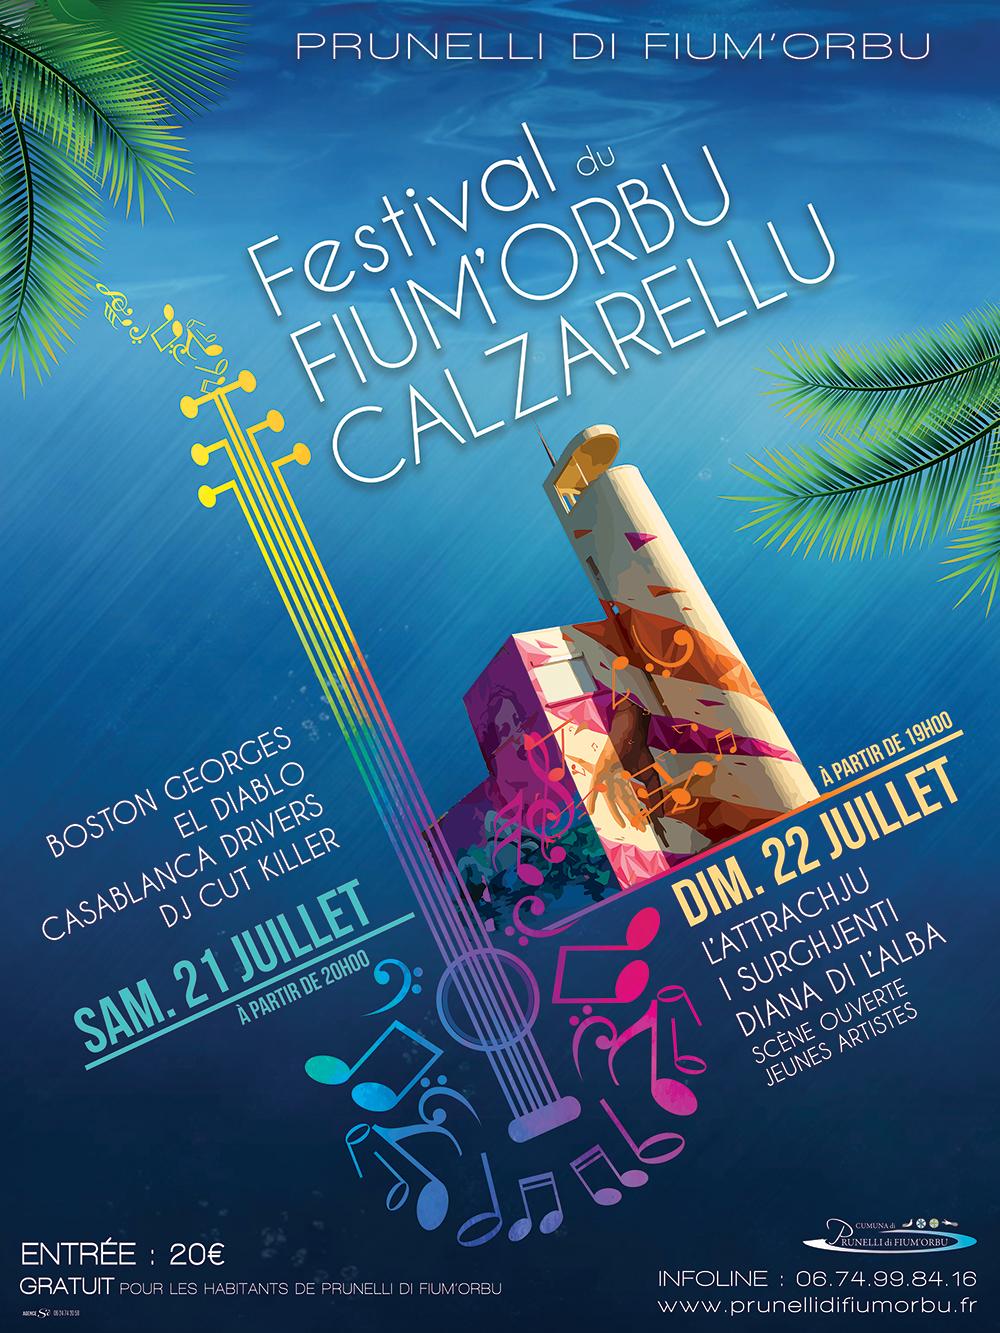 Une seconde vie pour le Festival du Fium'Orbu Calzarellu